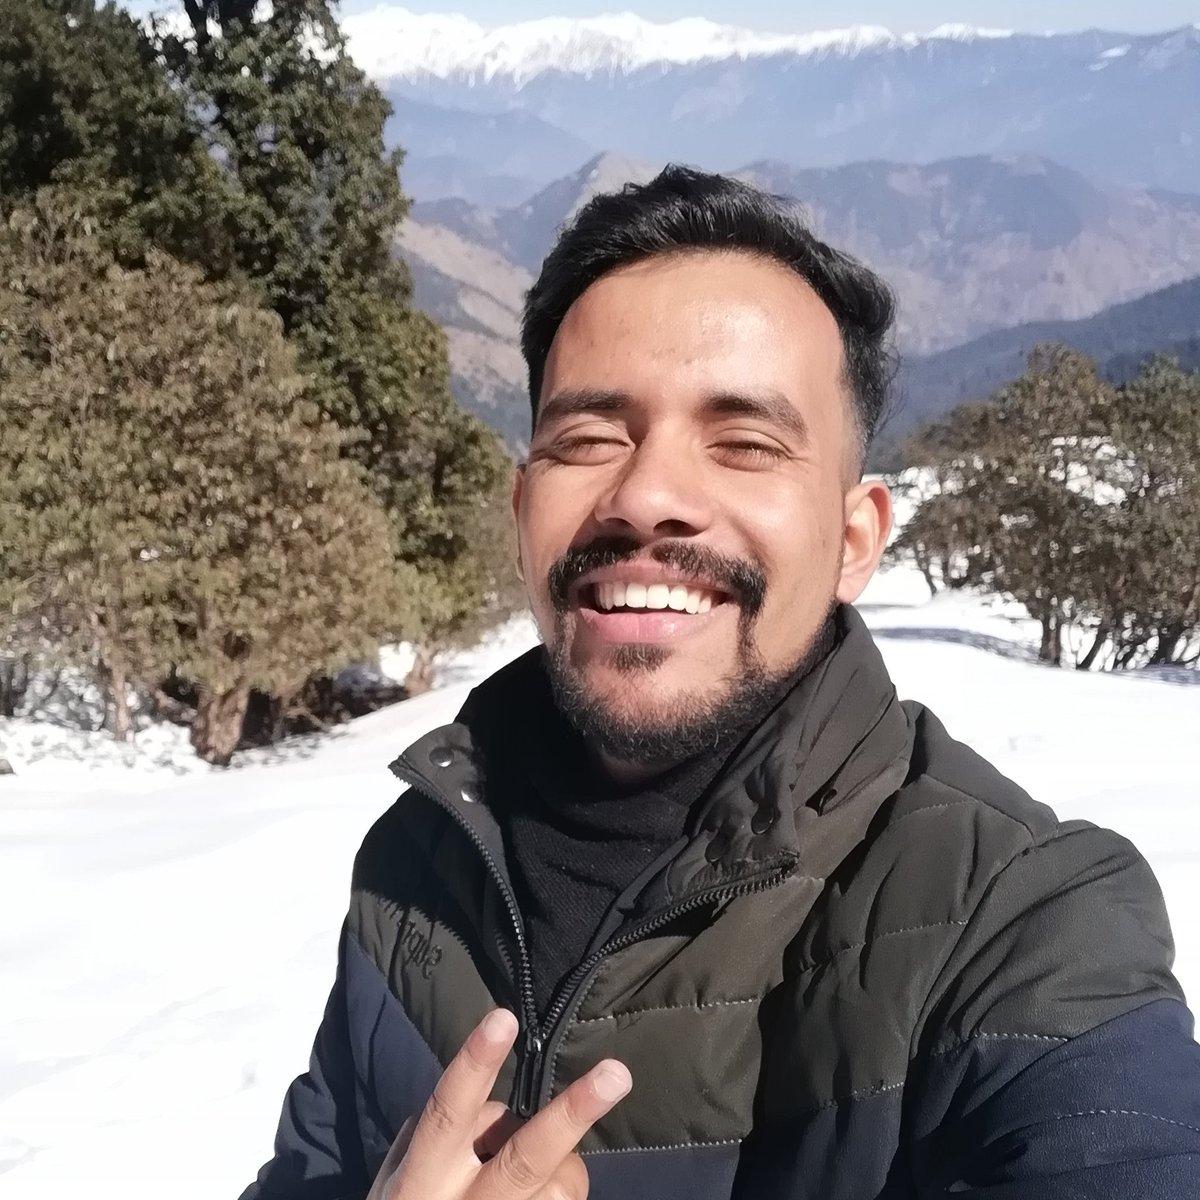 #NewProfilePic #Tungnath #Chopta #Uttarakhand https://t.co/c2tqHvMTn2